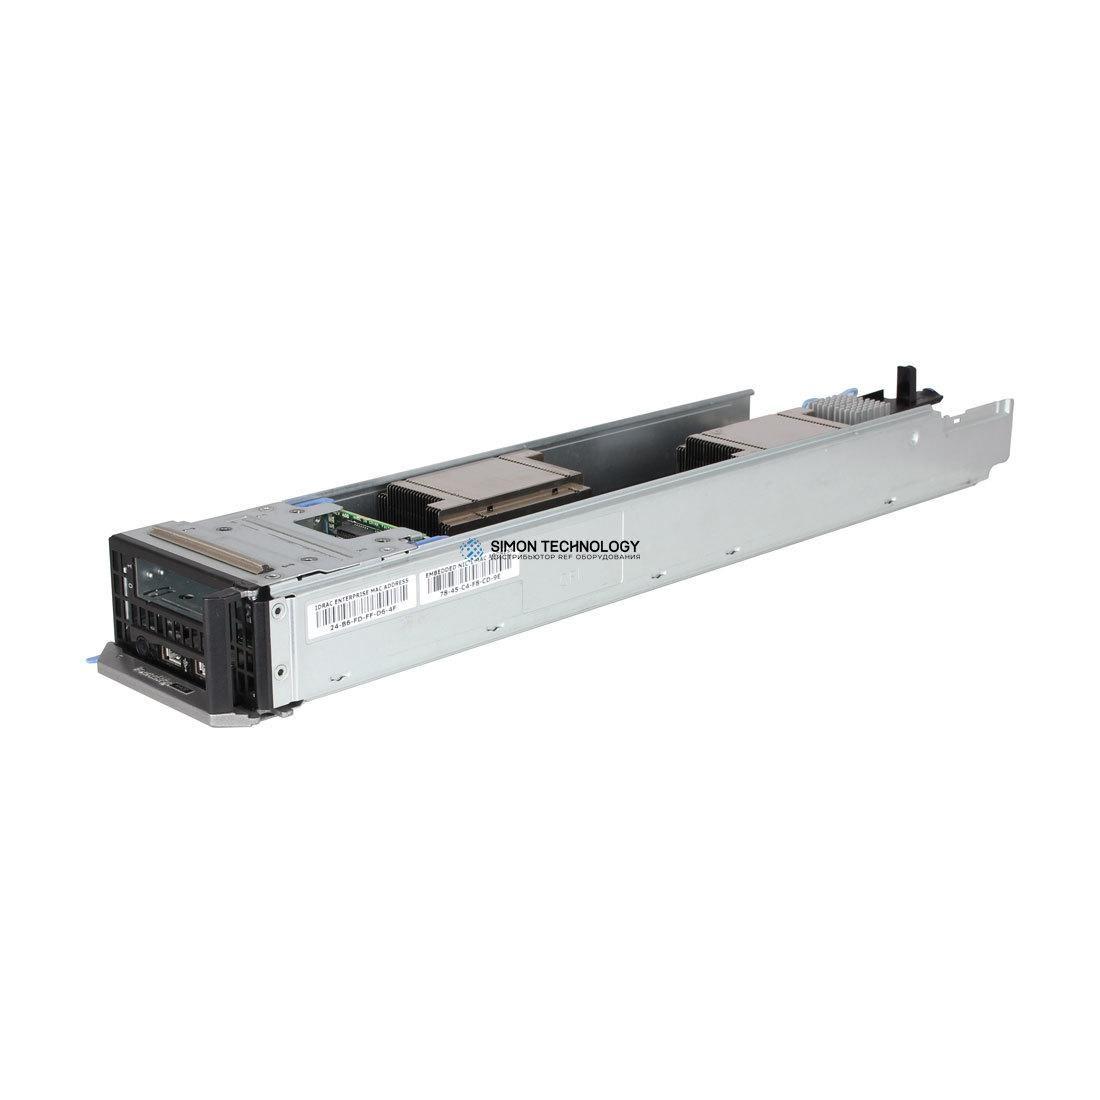 Сервер Dell PEM420 CONFIGURE-TO-ORDER BLADE SERVER (M420-CTO)